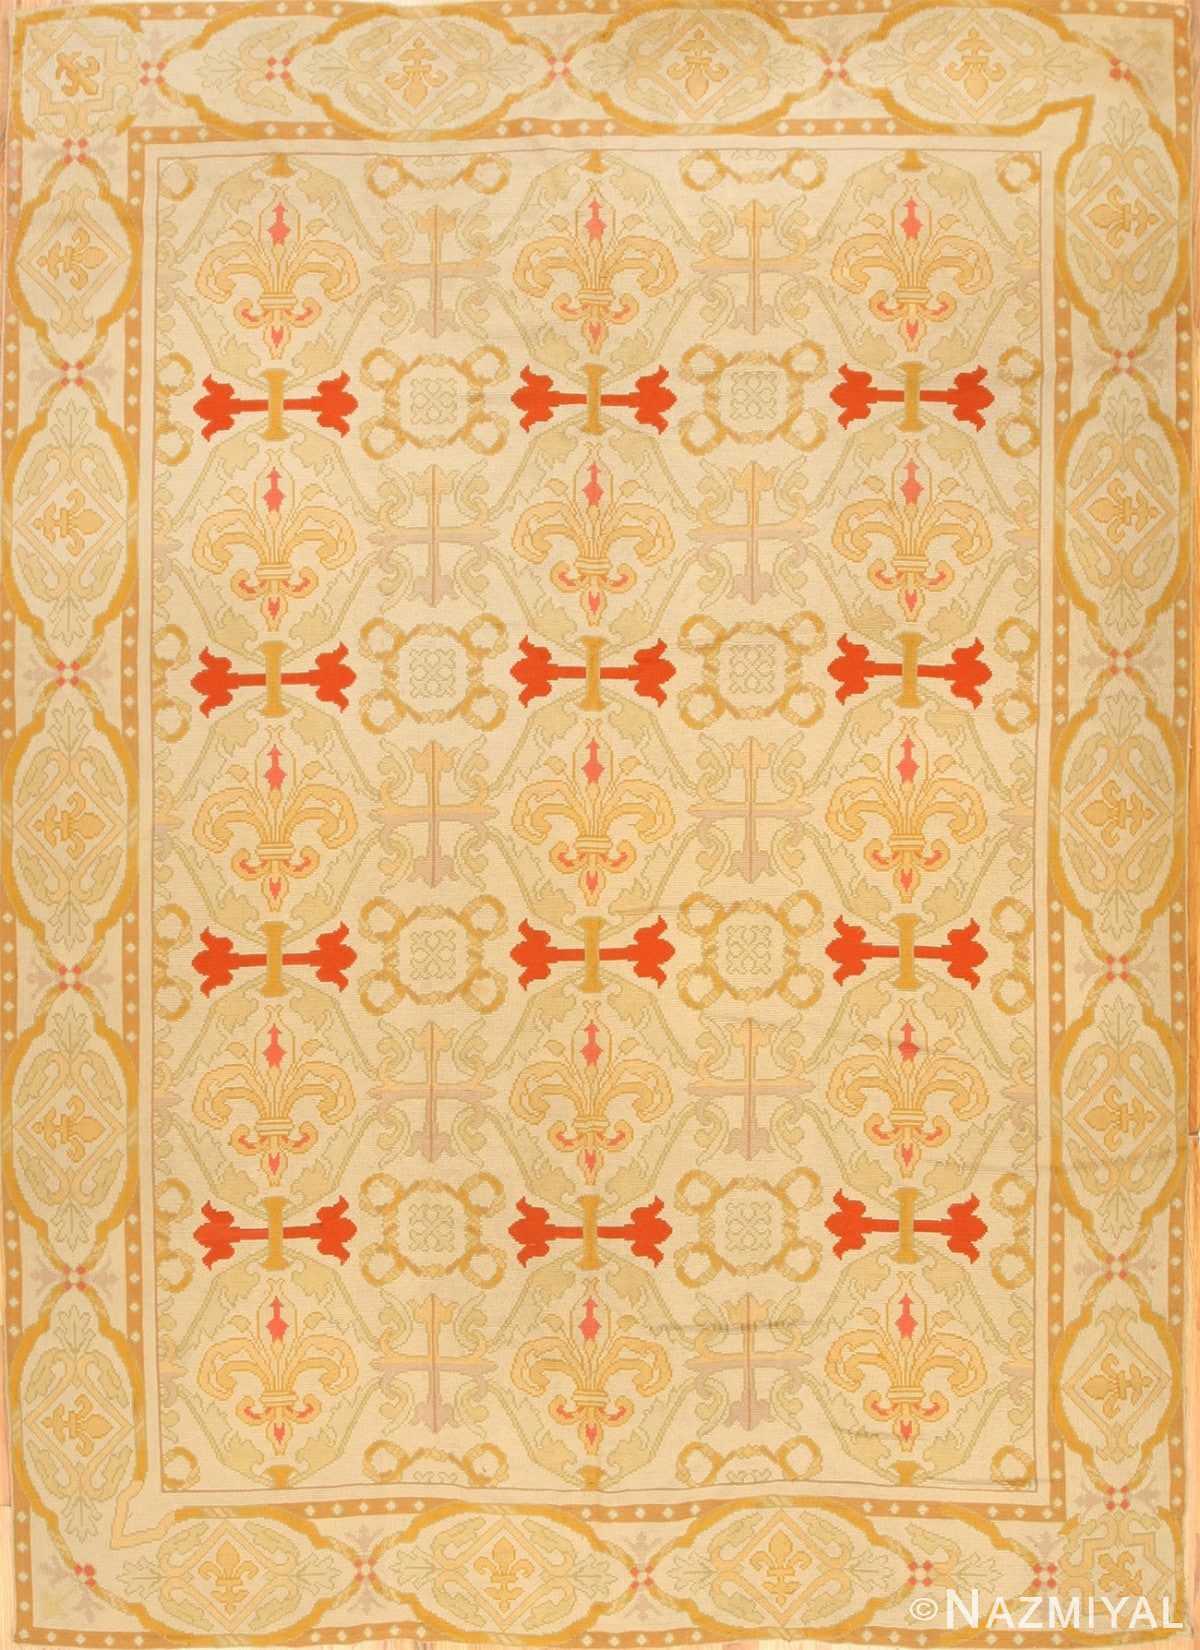 Fleur De Lis Design Antique Needlepoint English Rug 1112 Nazmiyal